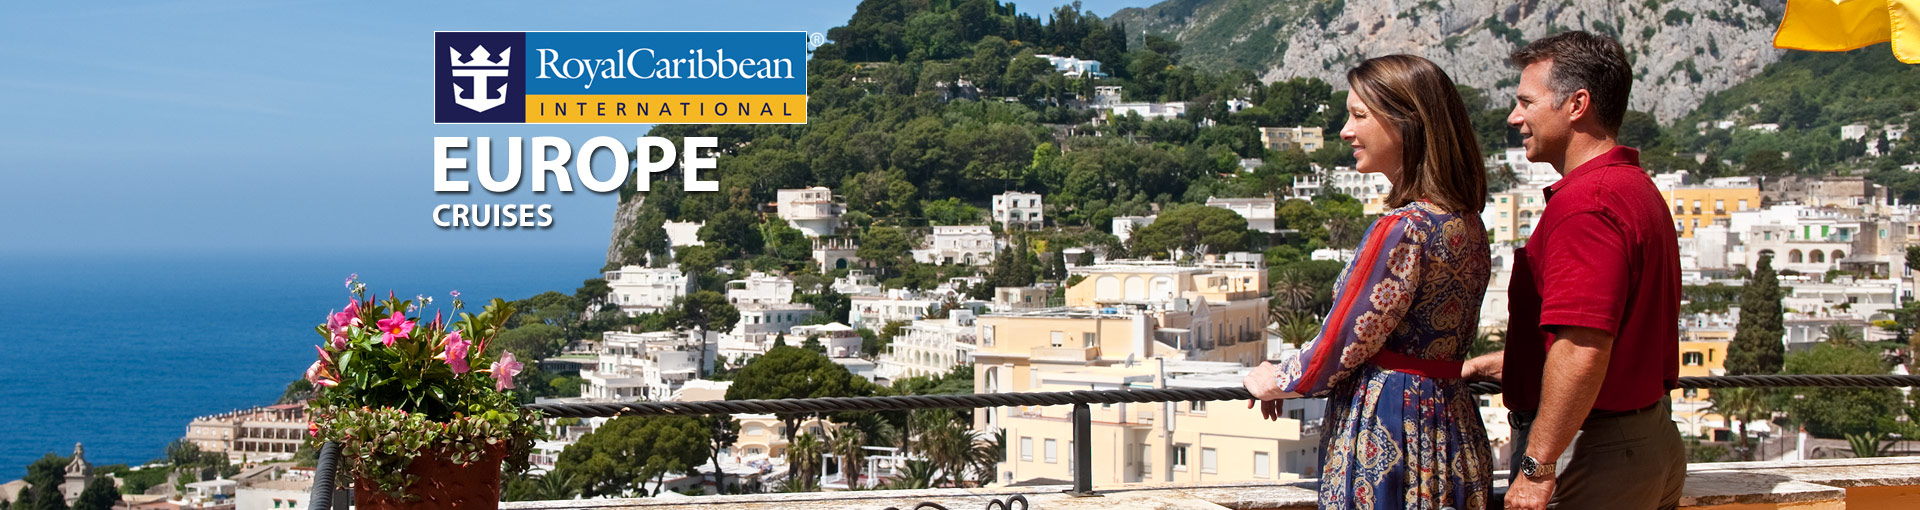 Royal Caribbean Europe Cruises